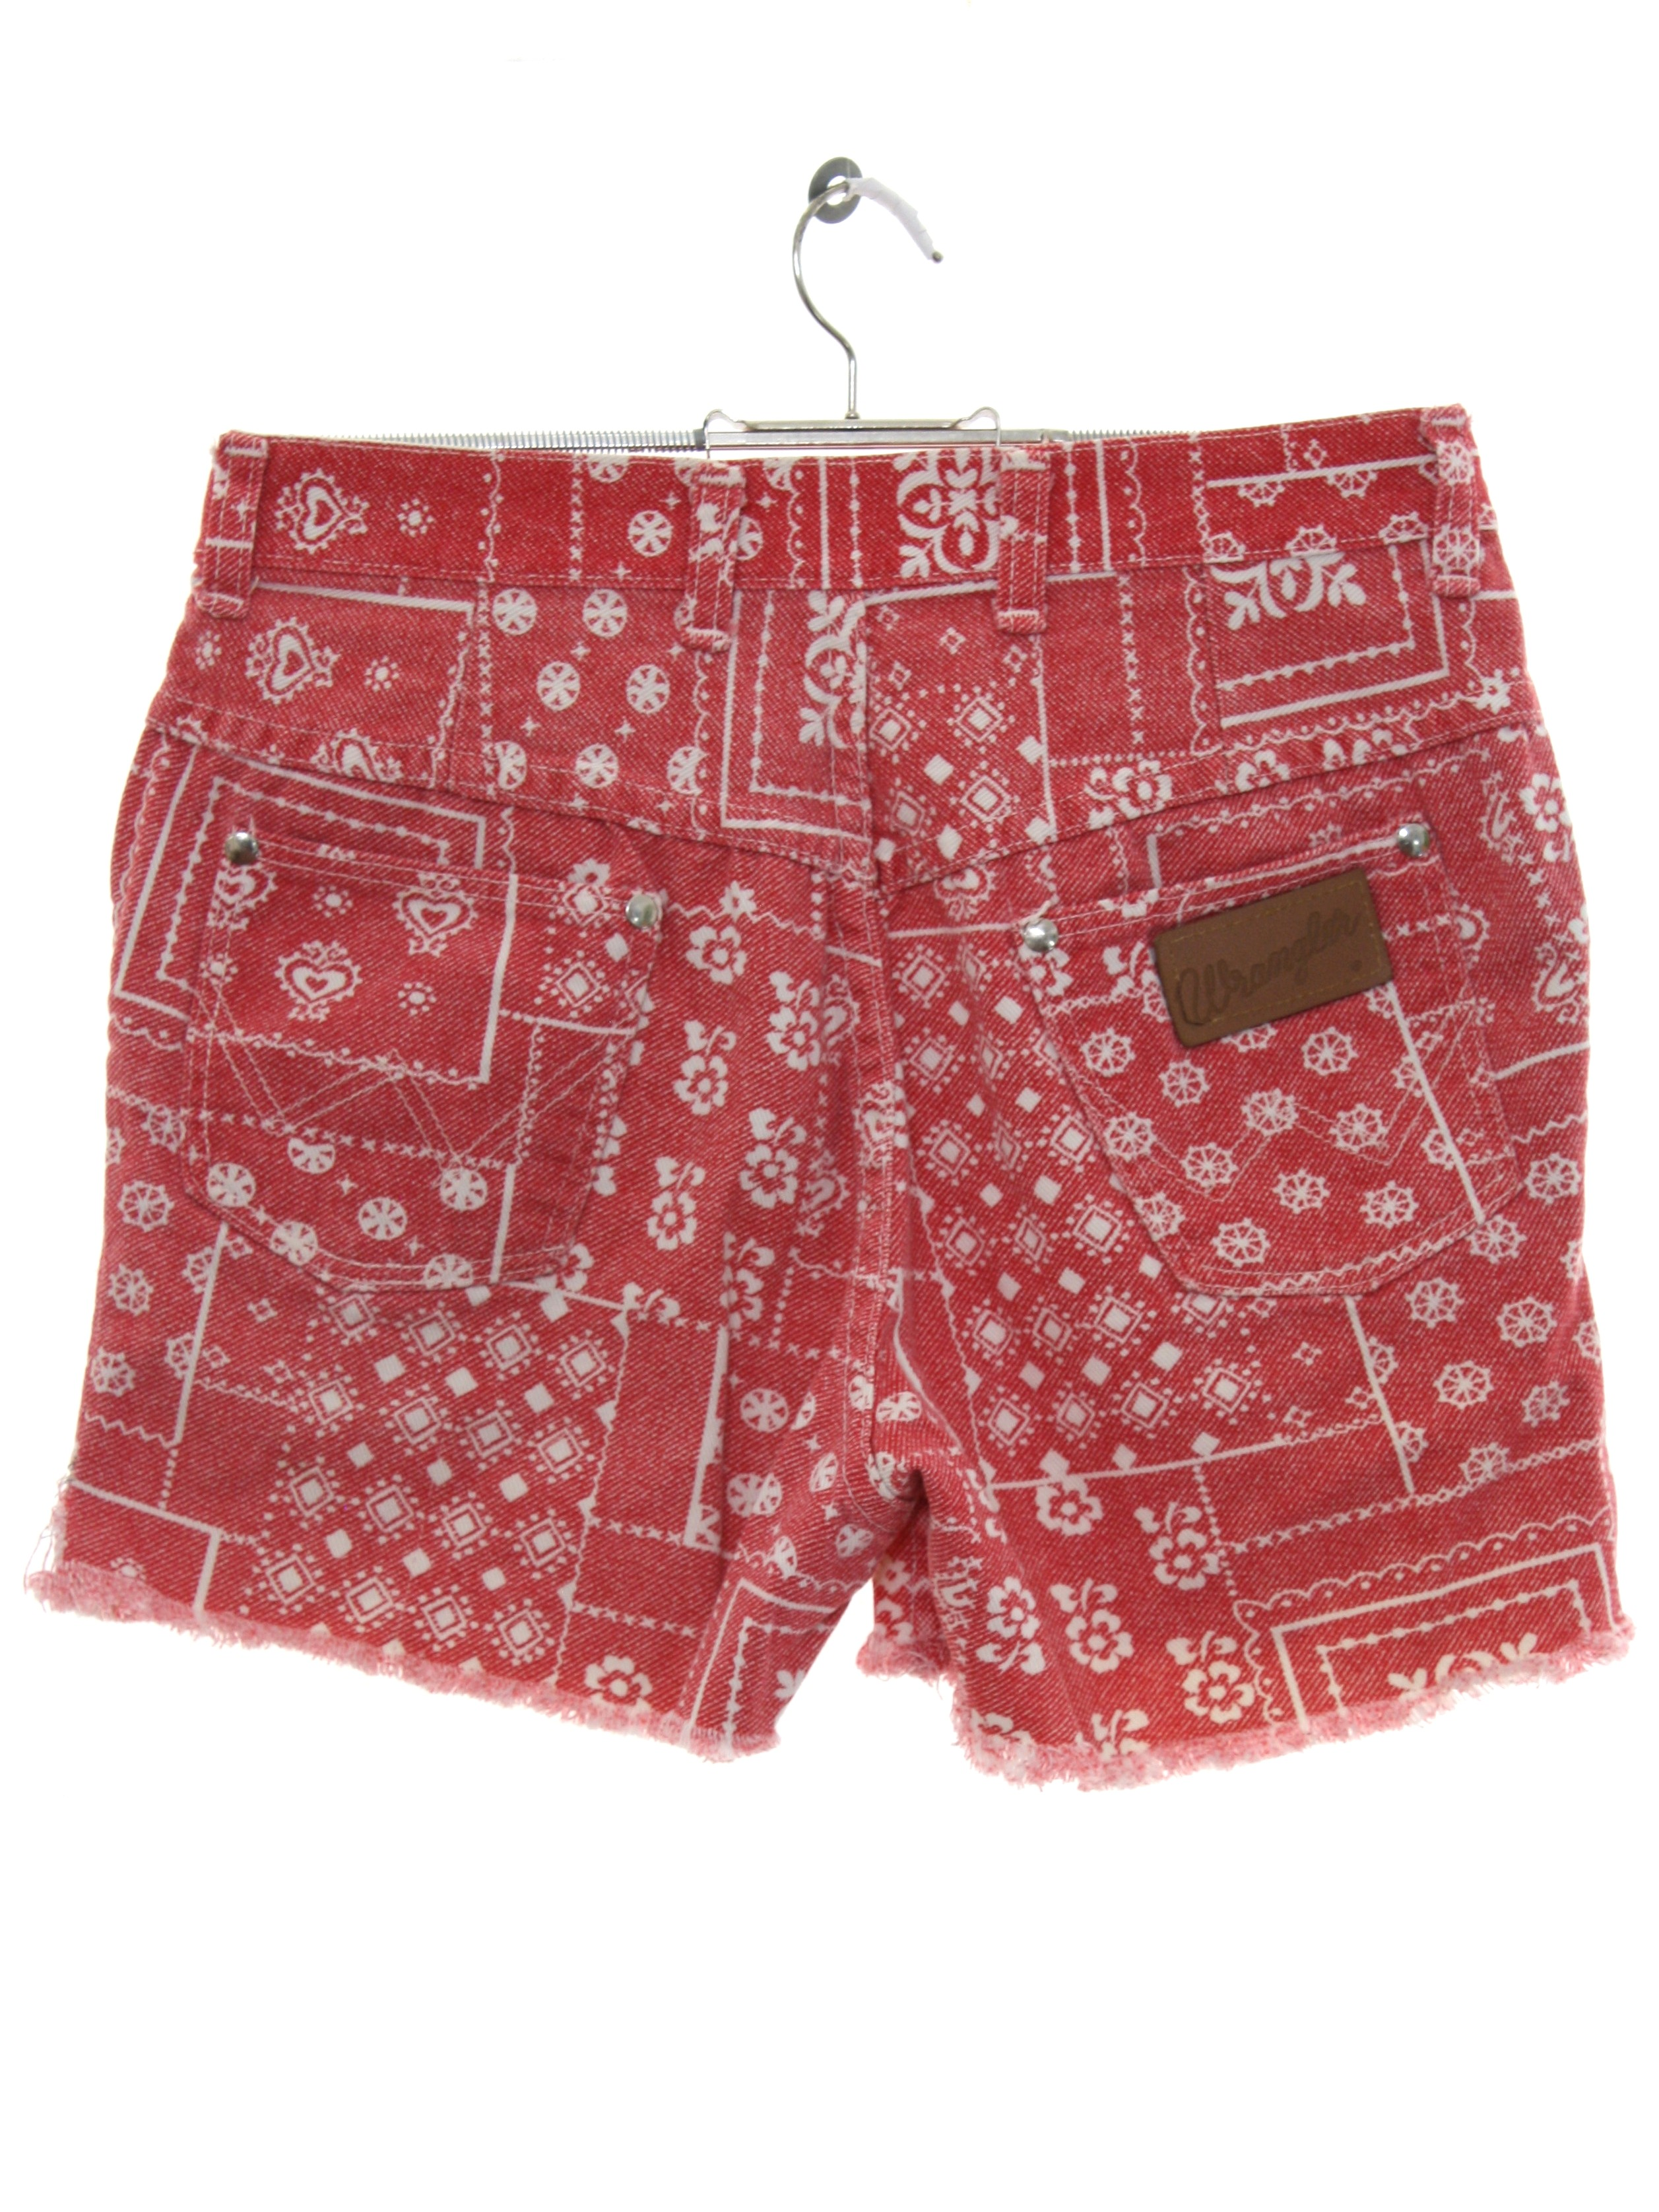 880ffb5fde 1980's Wrangler Womens Totally 80s High Waisted Denim Shorts